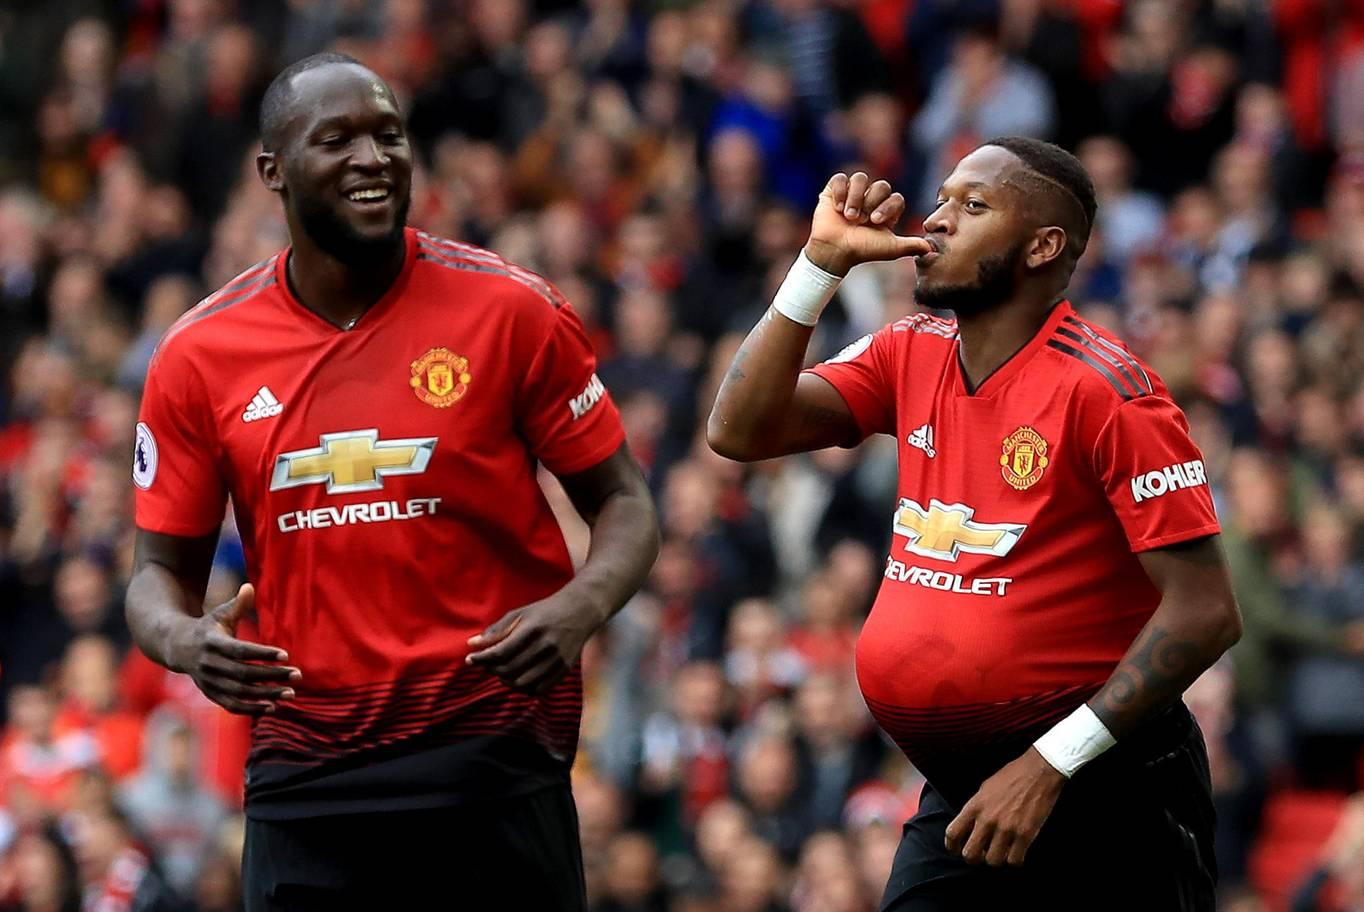 Elenco Do Manchester United: Confira Os Jogadores Da